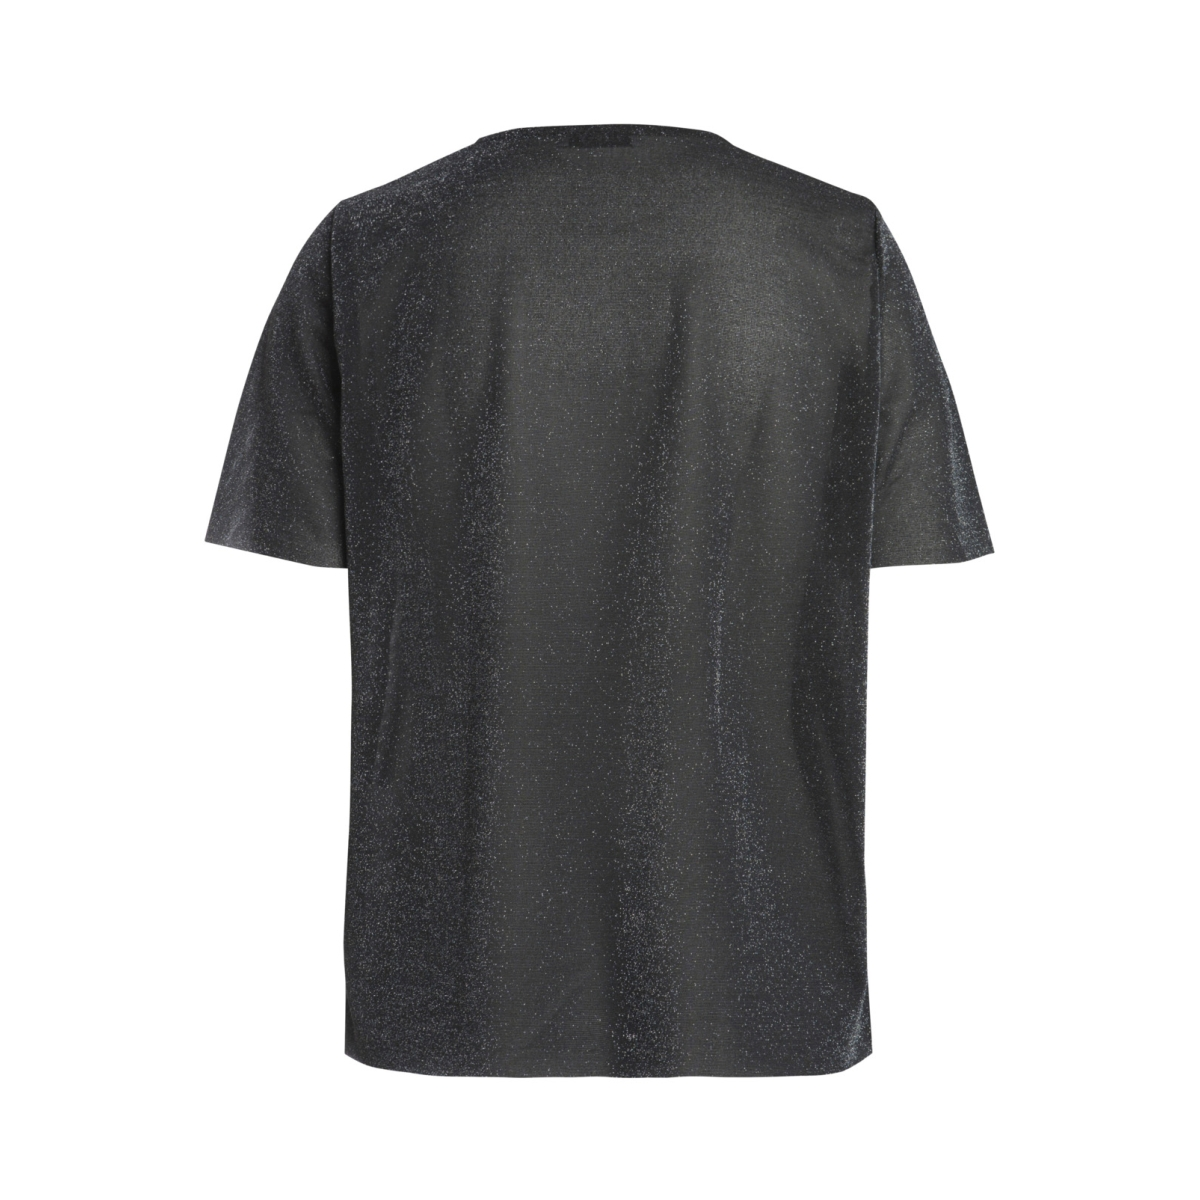 pcrima s/s tee 17085424 pieces t-shirt black